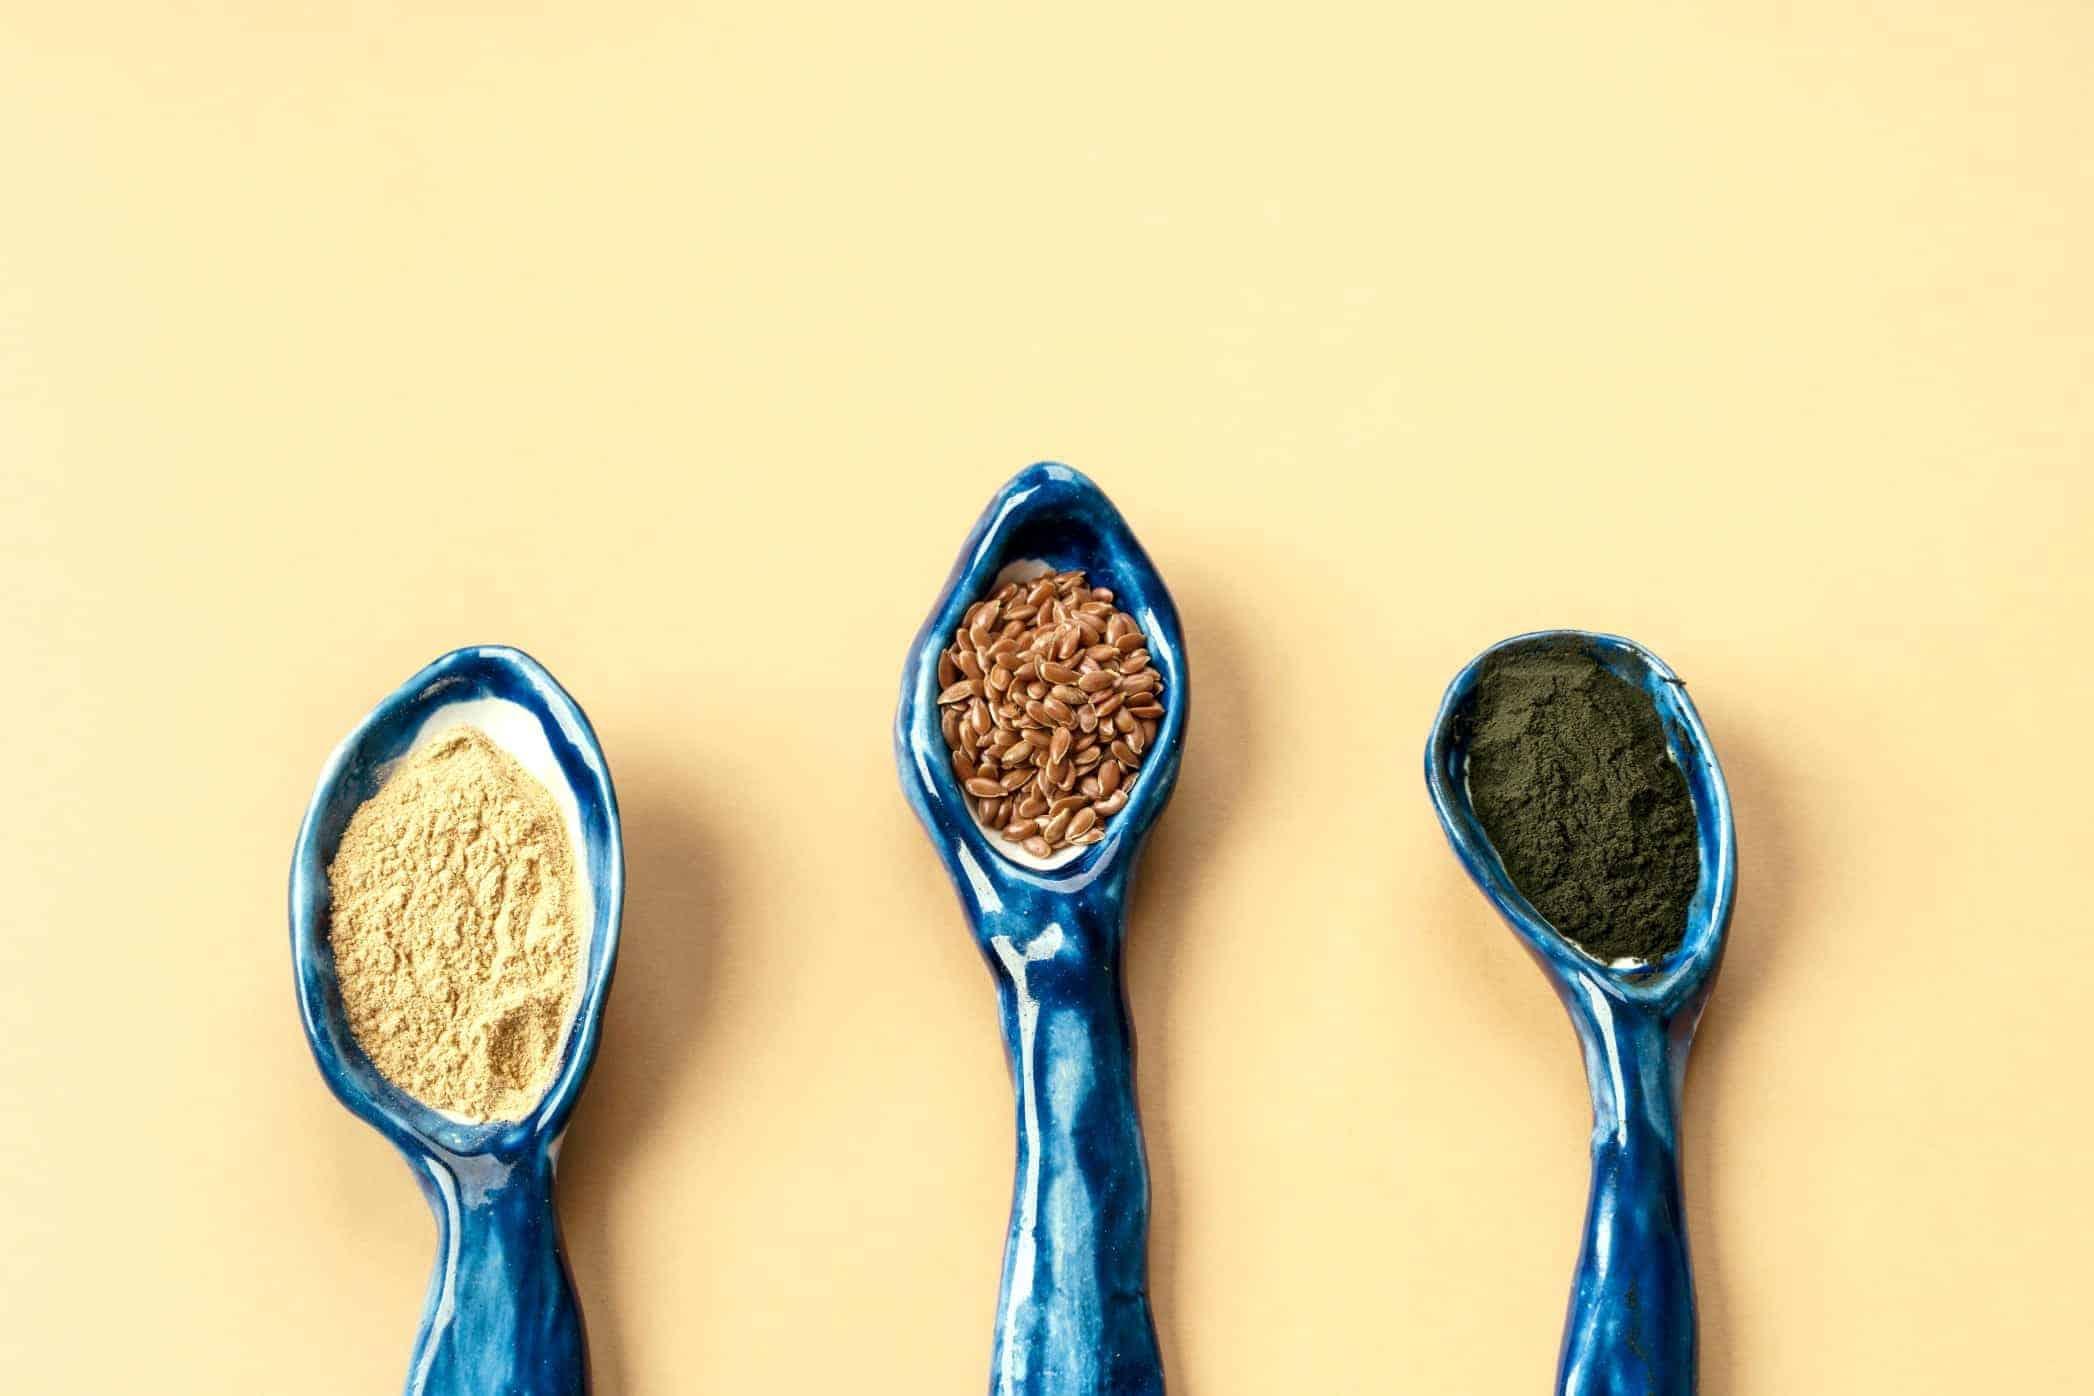 three blue ceramic clay spoons with flax seeds, chlorella powder, matcha and maca